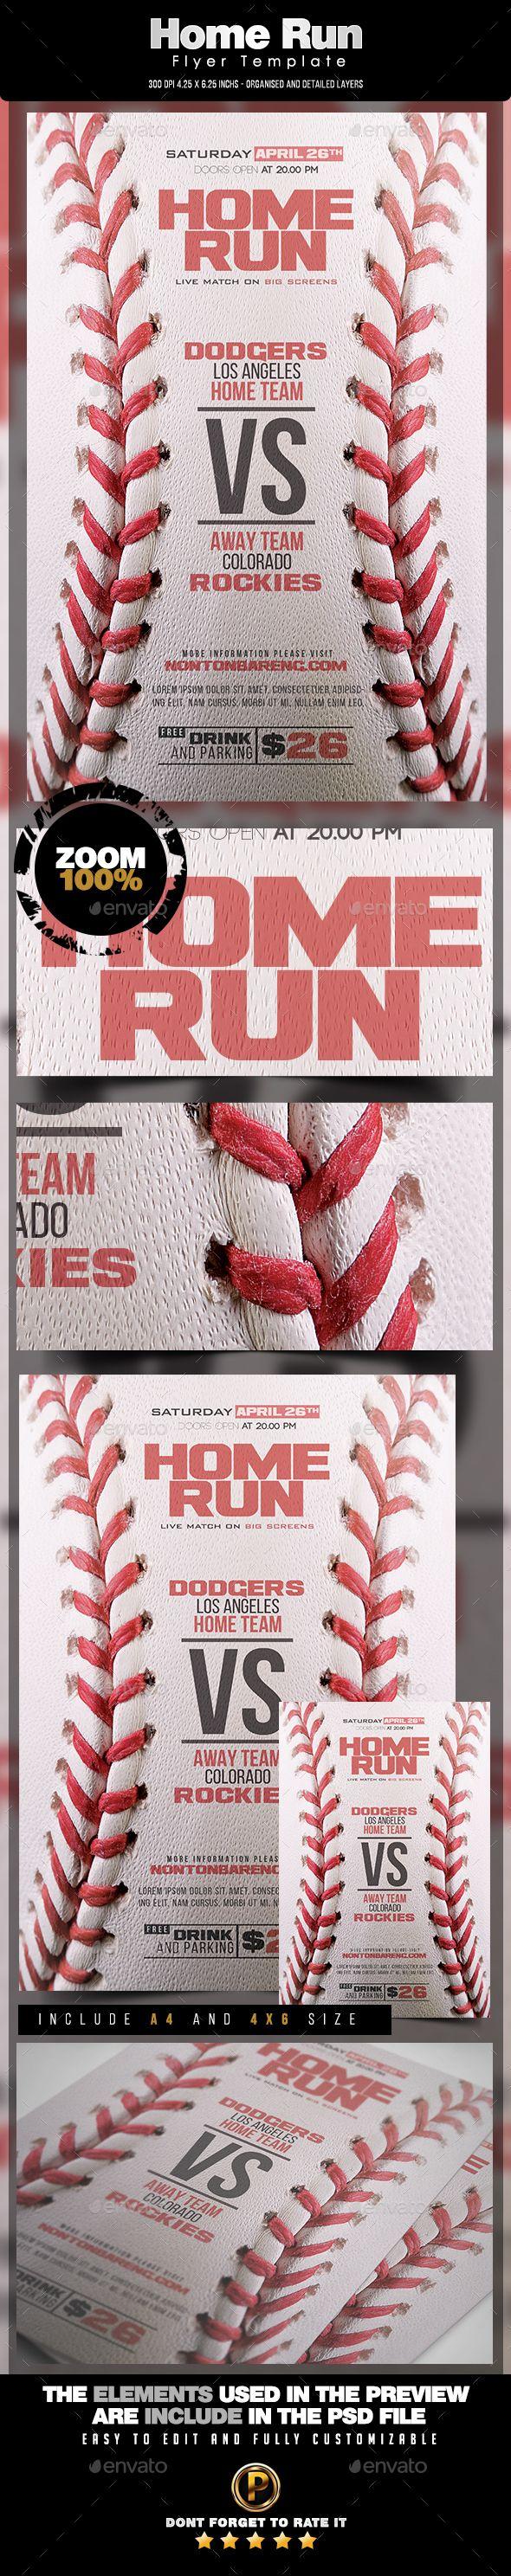 Home Run Flyer Template PSD. Download here: http://graphicriver.net/item/home-run-flyer-template/15787953?ref=ksioks